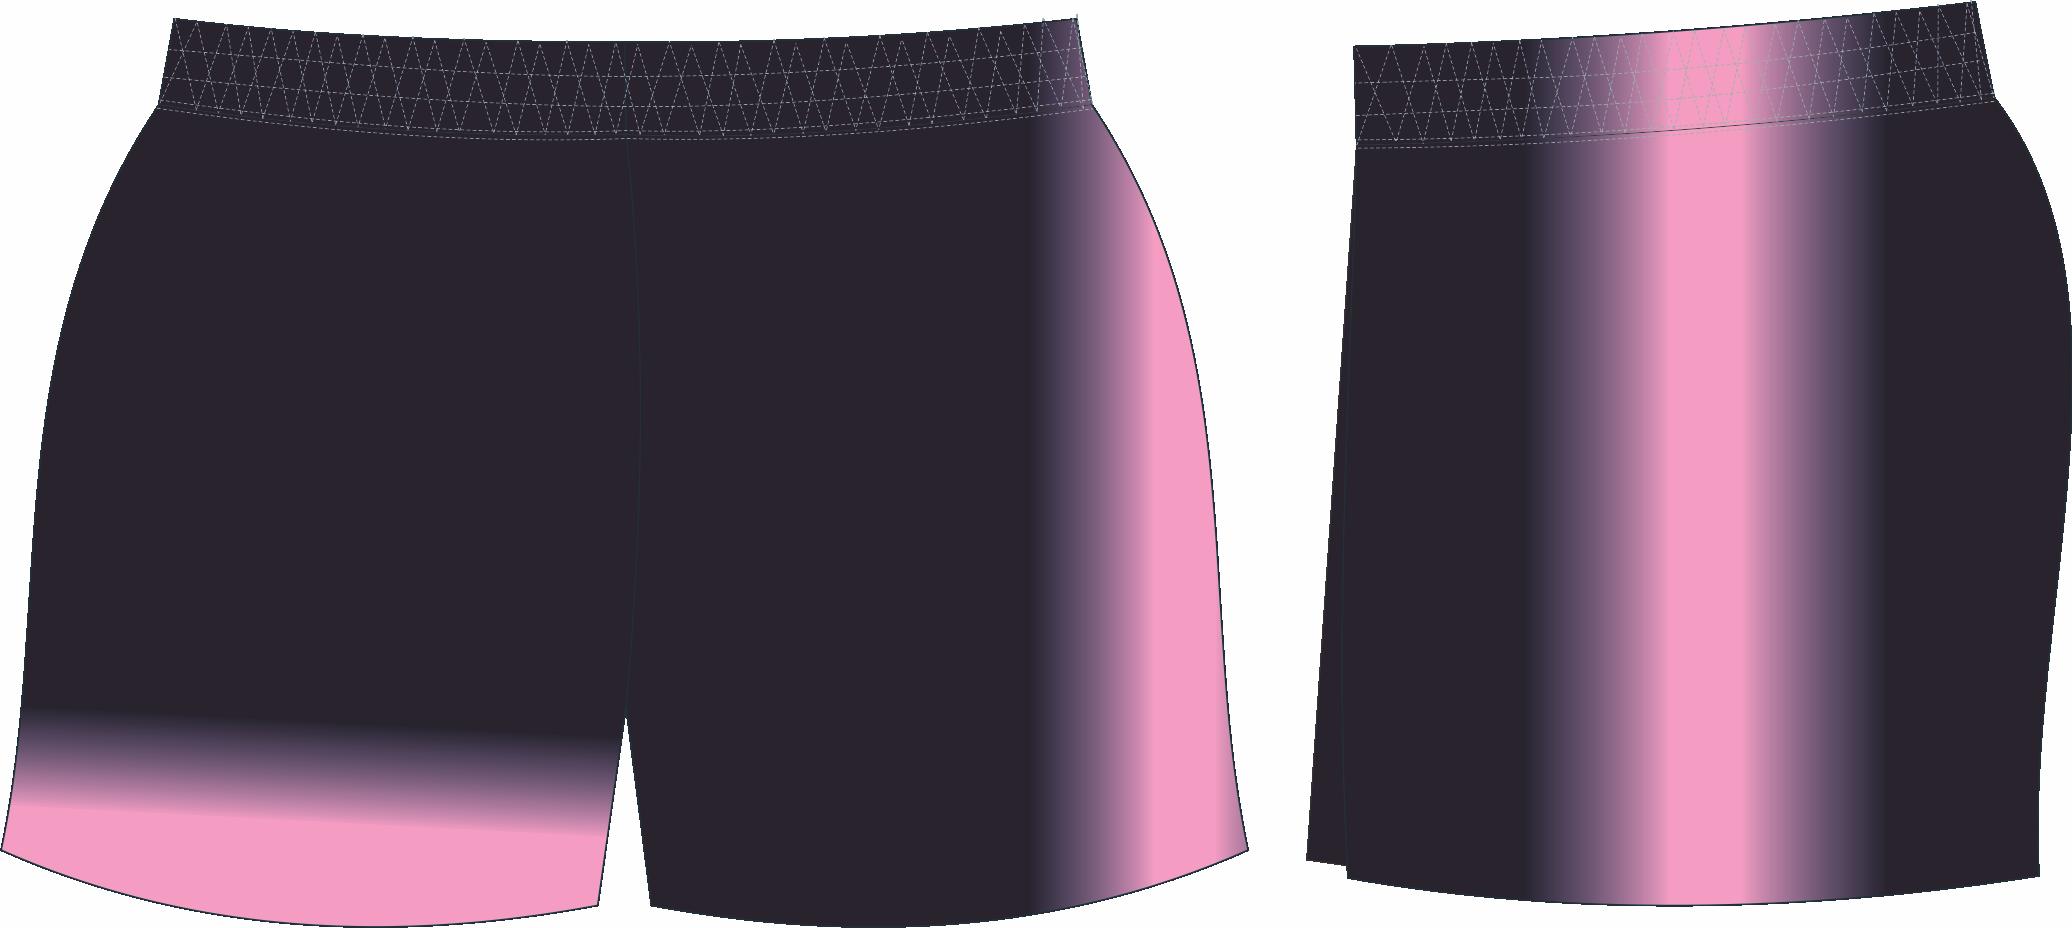 S205XSHT Black Pink.png